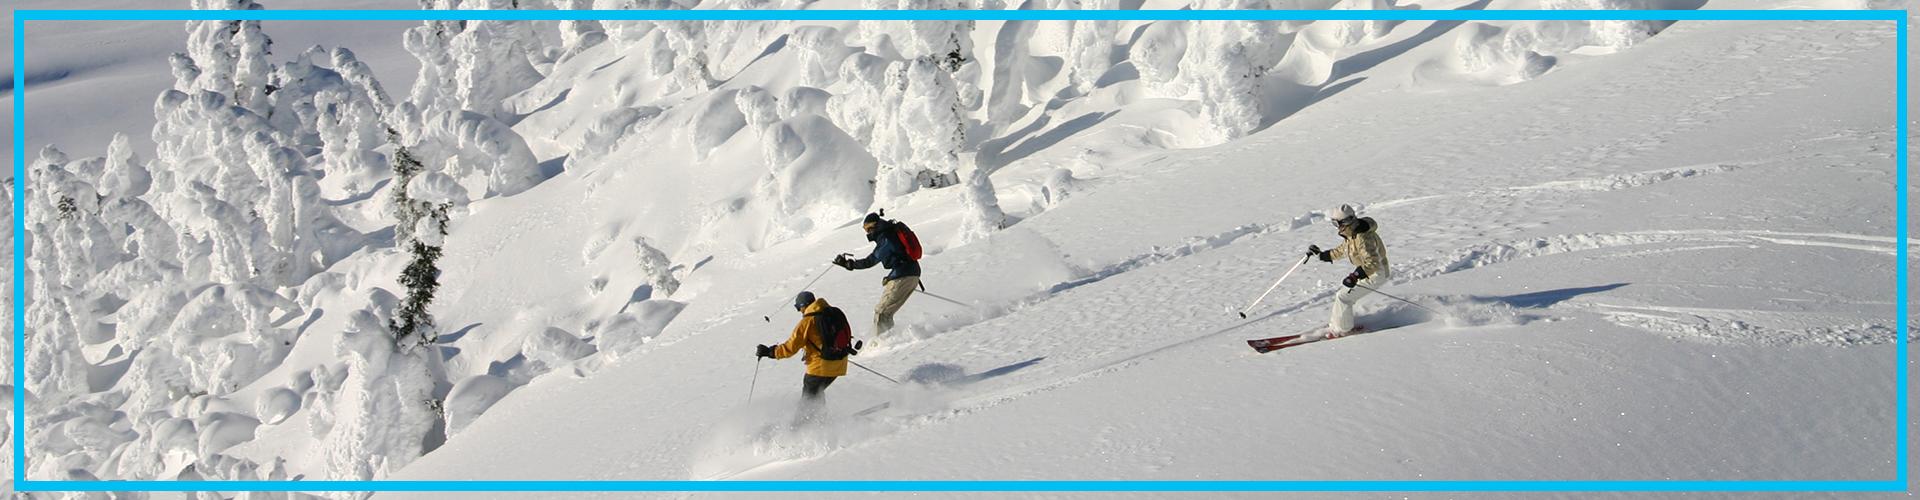 World-class skiing in Canada